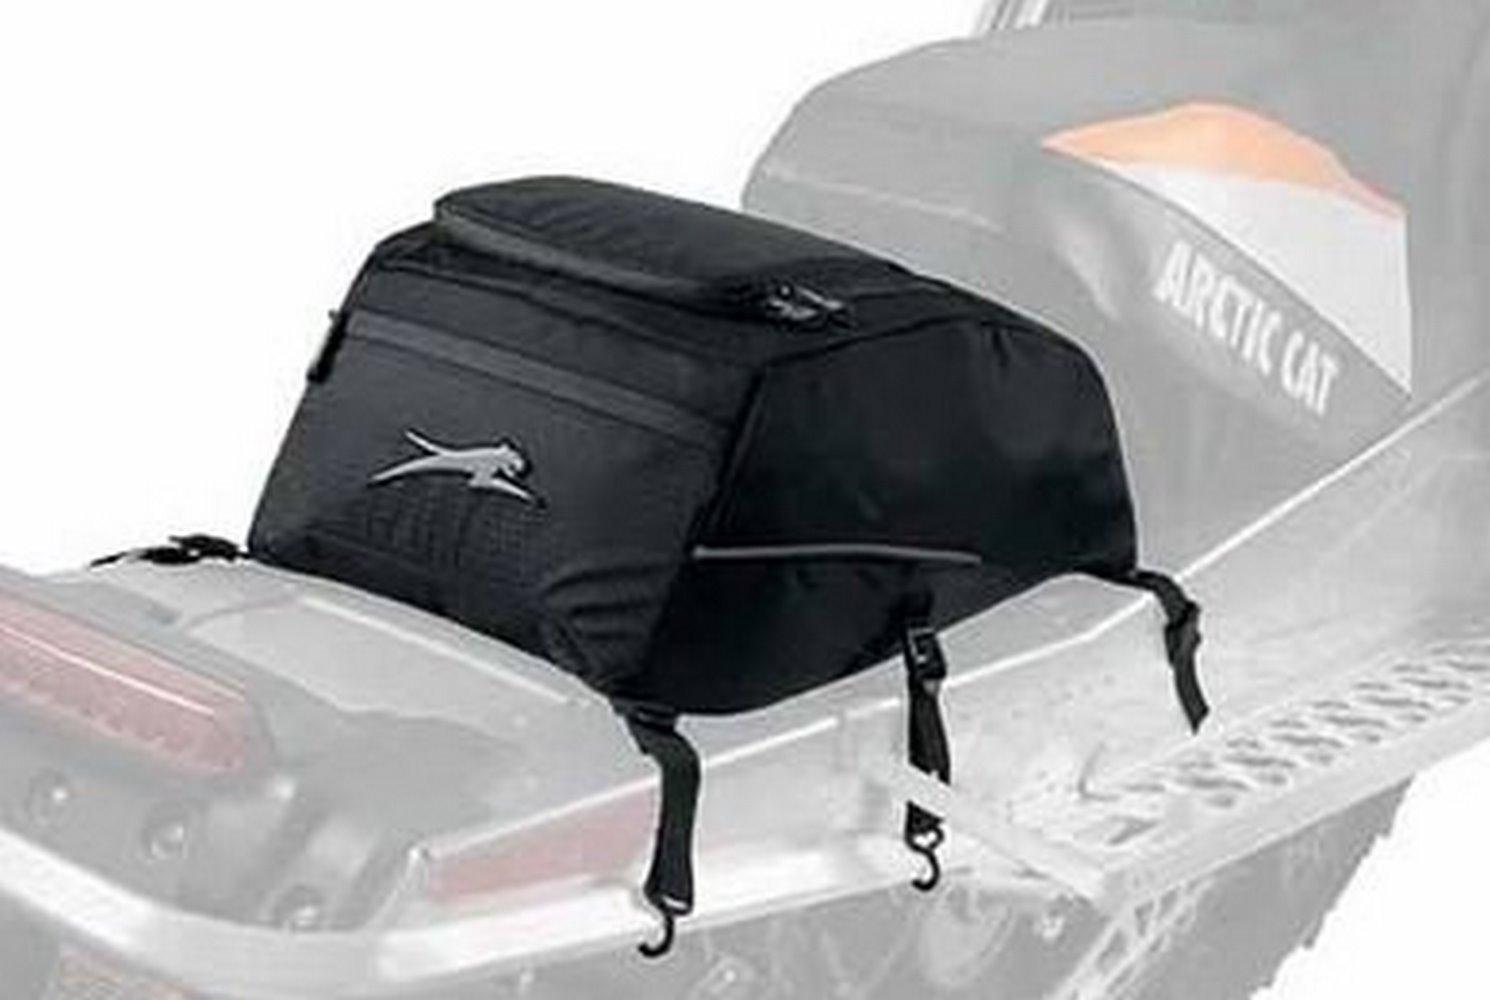 Arctic Cat Snowmobile Tunnel Gear Bag Lynx 2000 F5 F 570 Z1 F8 6639-704 by Arctic Cat